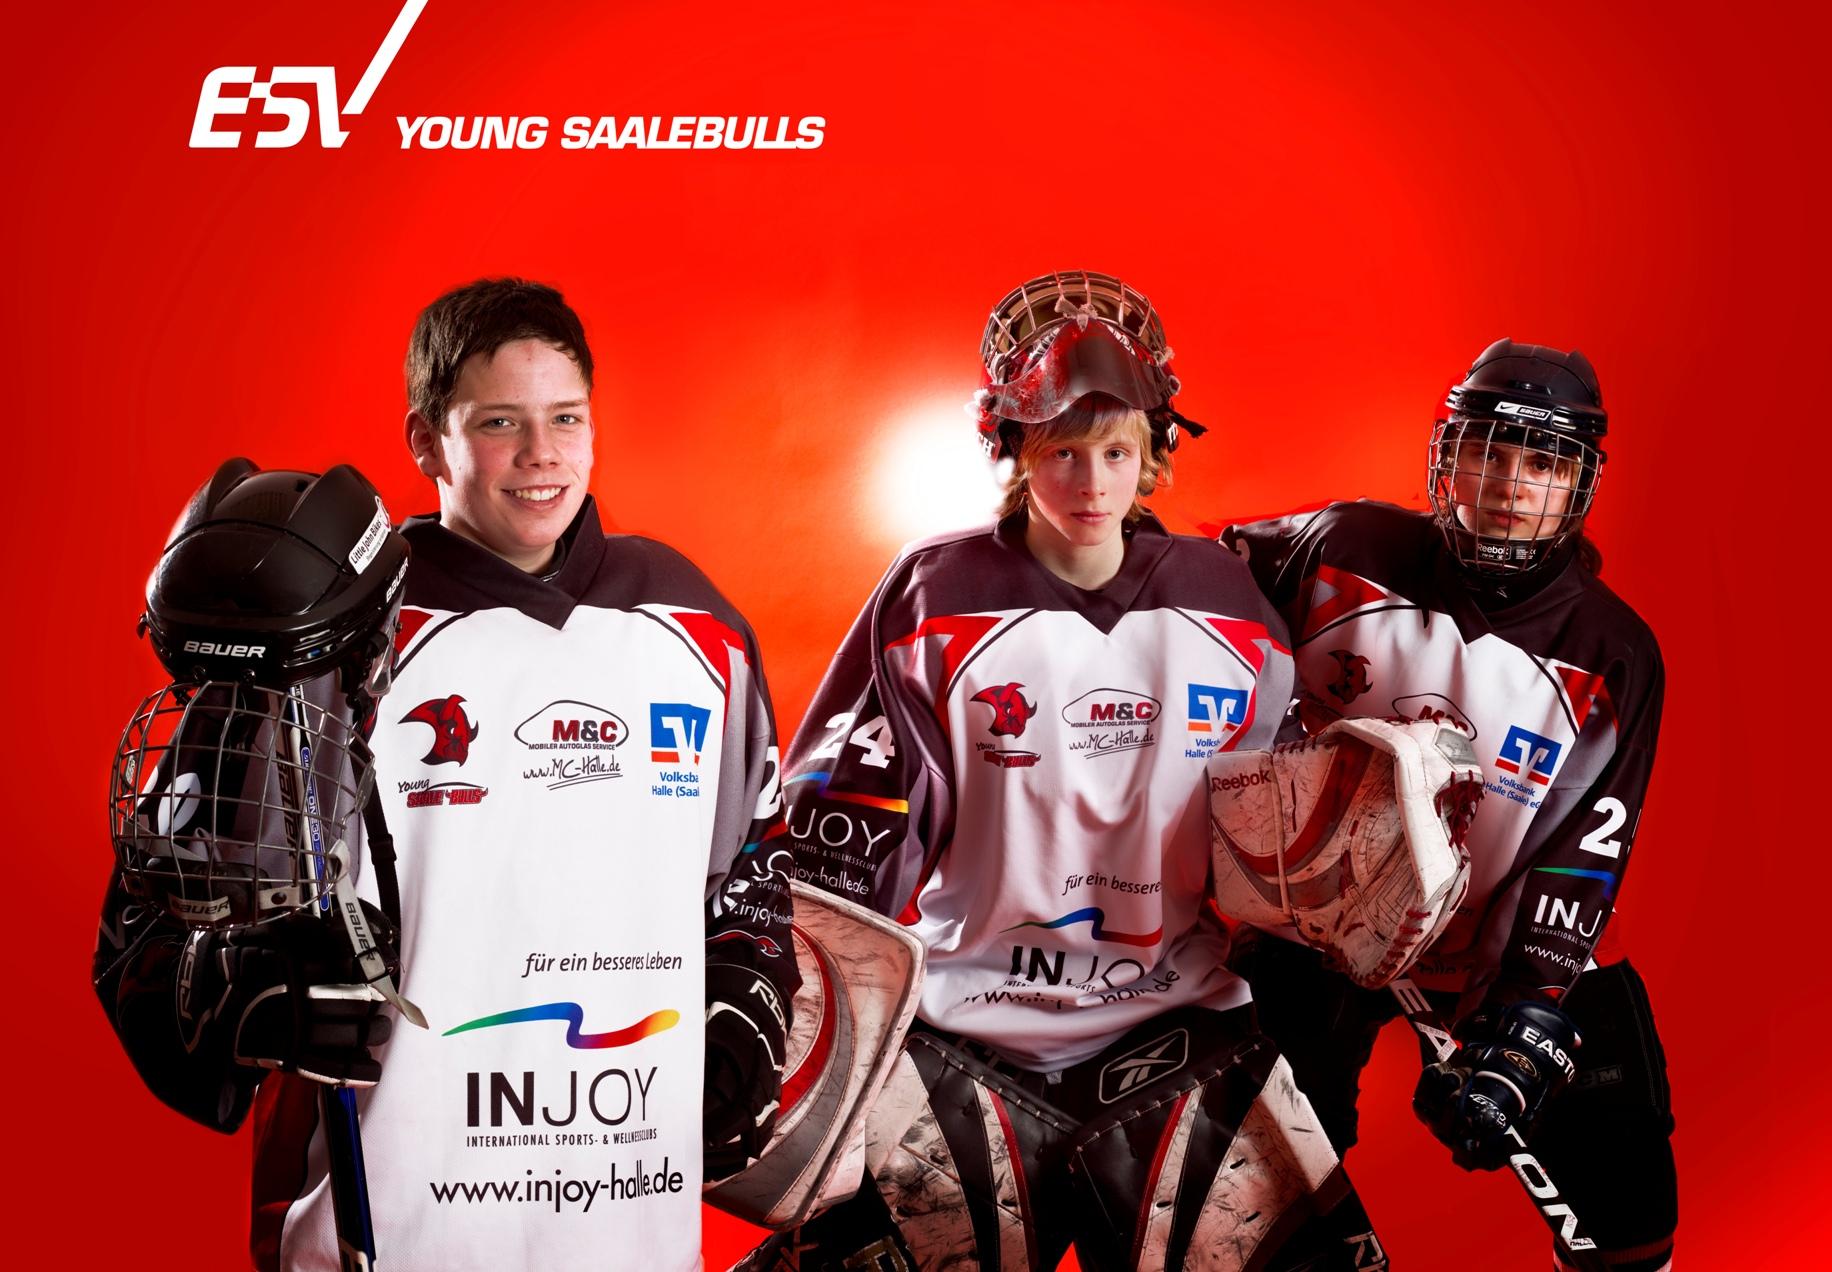 ESV Halle - young saalebulls; Copyright: Maigrün | Uwe Köhn; Rechte: Creative-common - Namensnennung http://www.maigruen.com